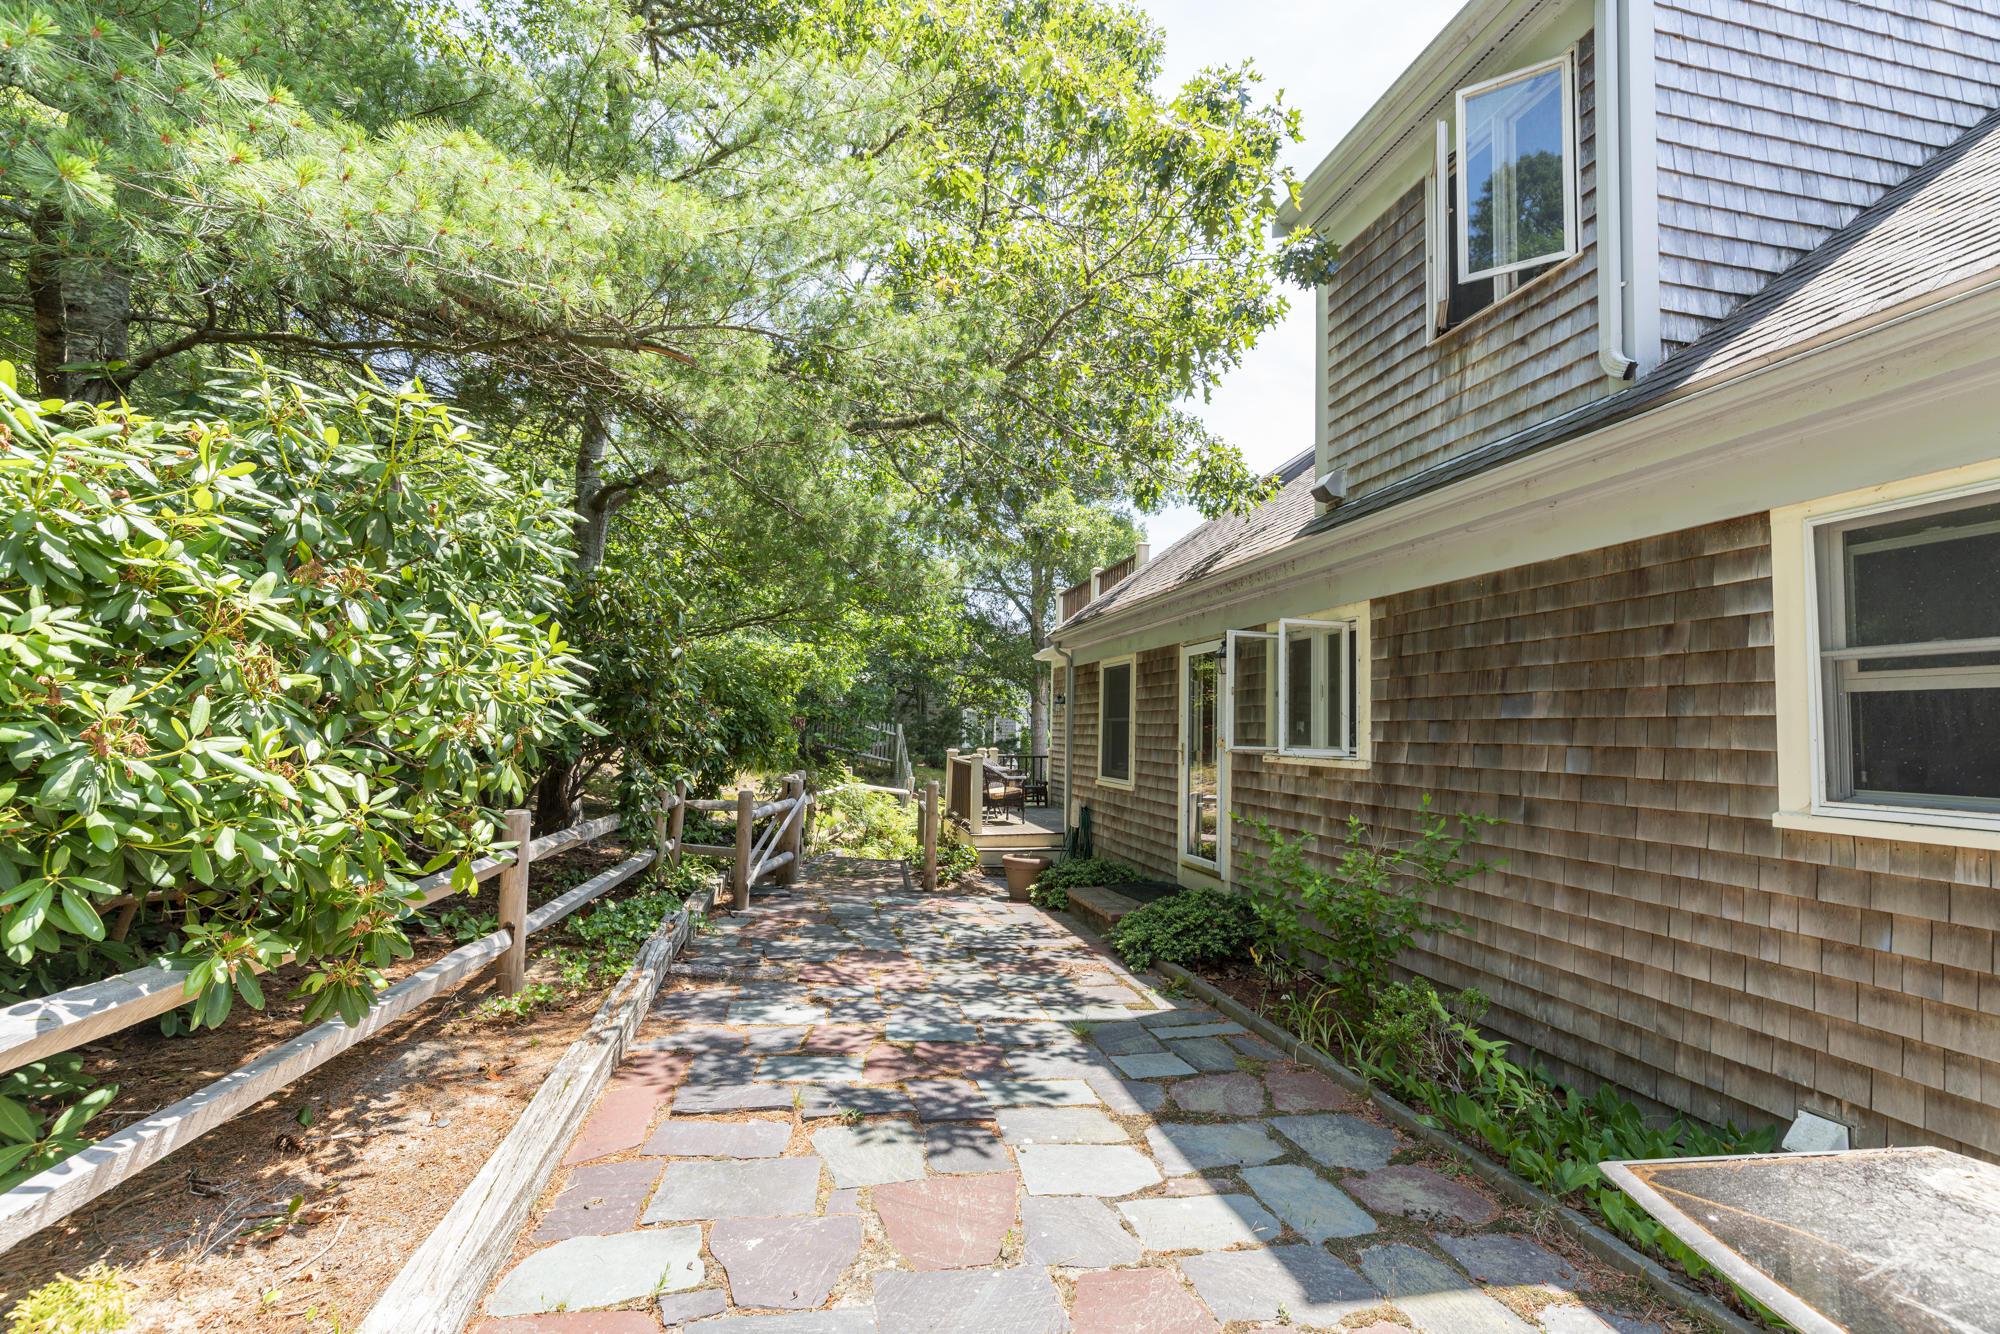 45 Wood Valley Road, Chatham, MA  02633 - slide 5